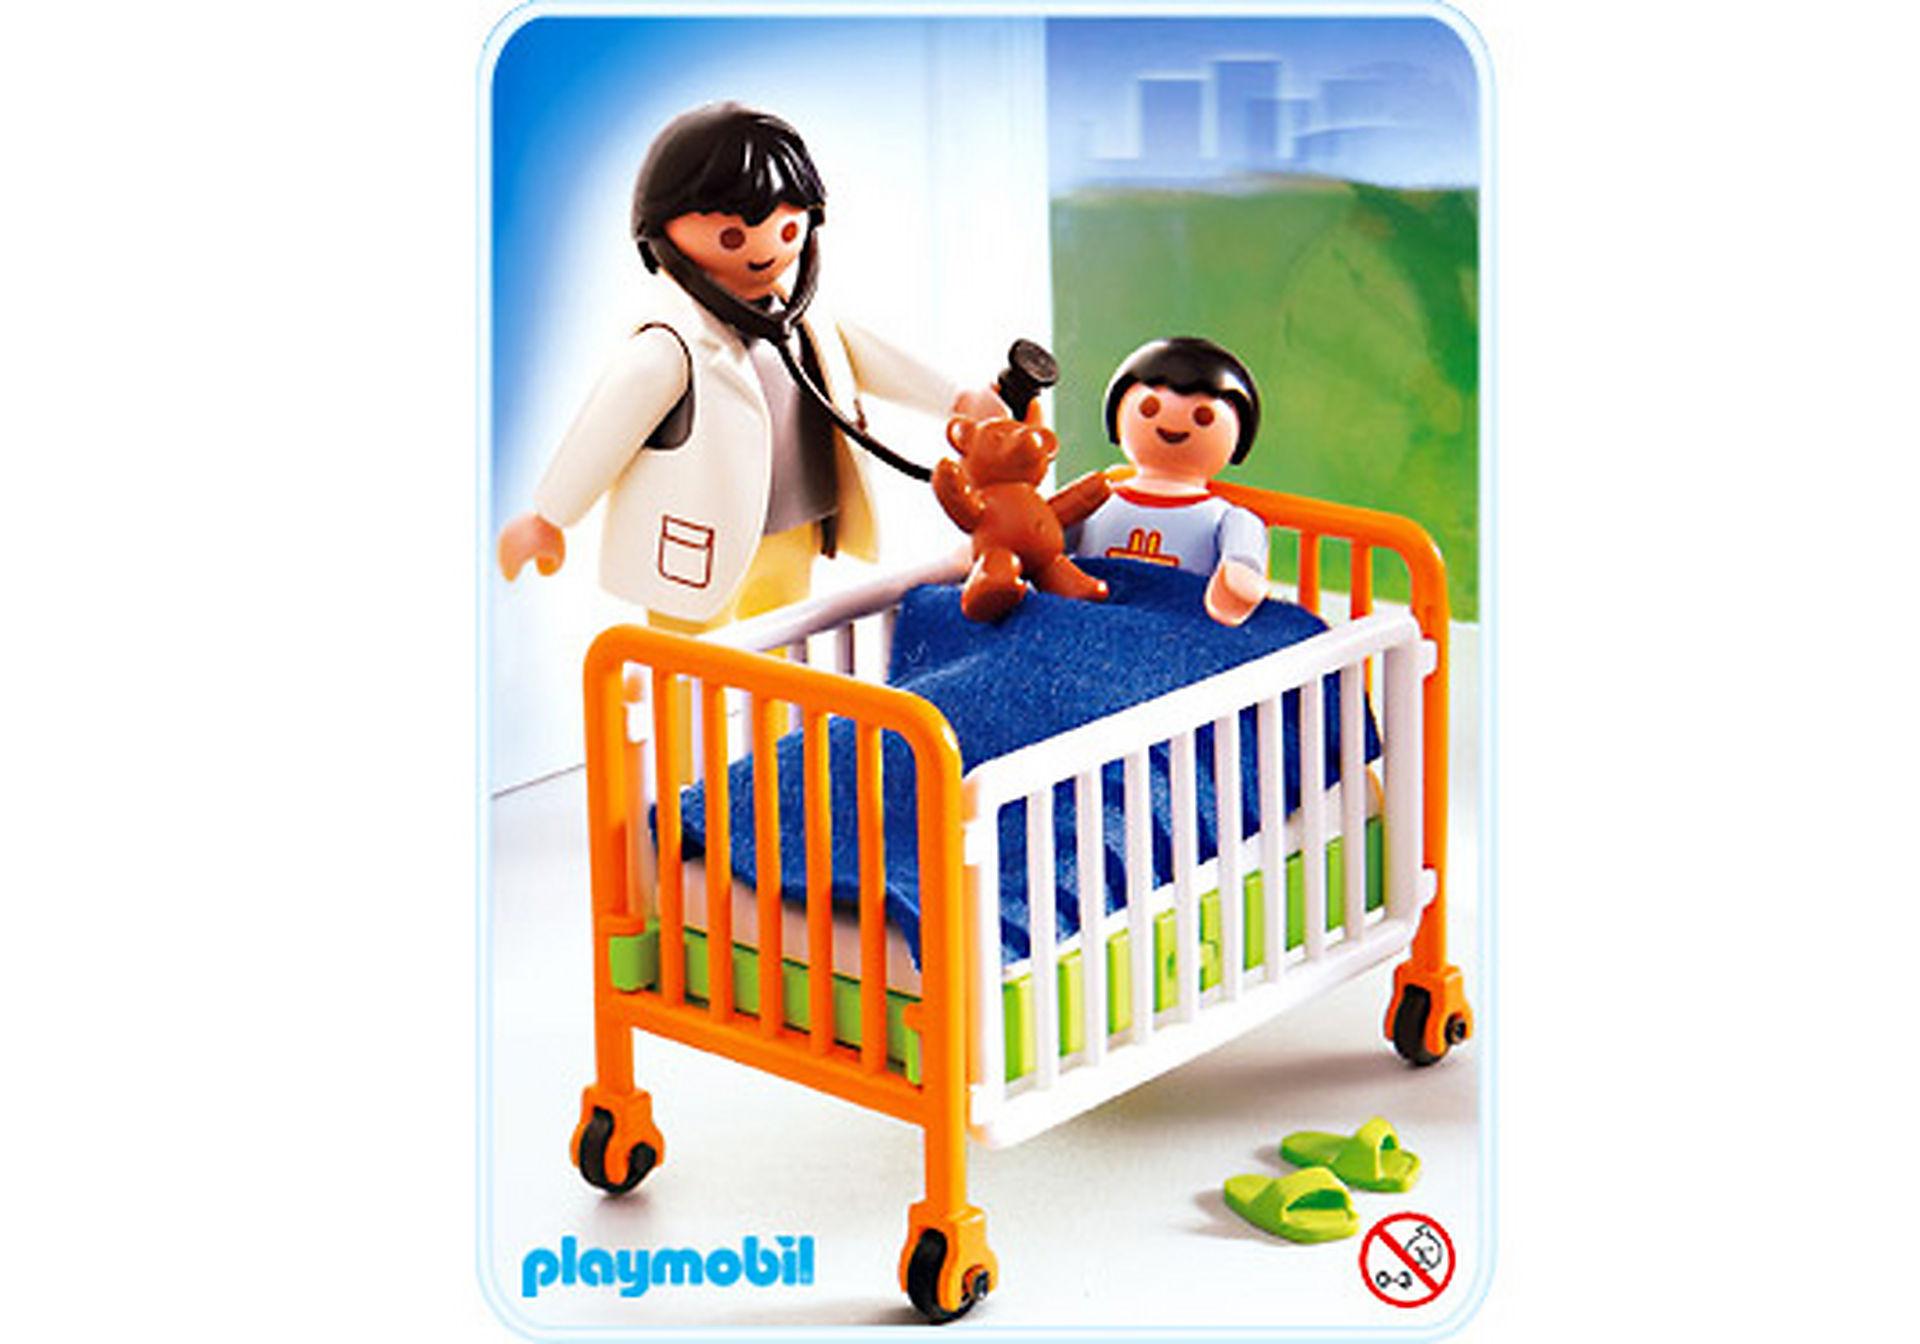 4406-A Médecin / enfant / lit d'hôpital zoom image1